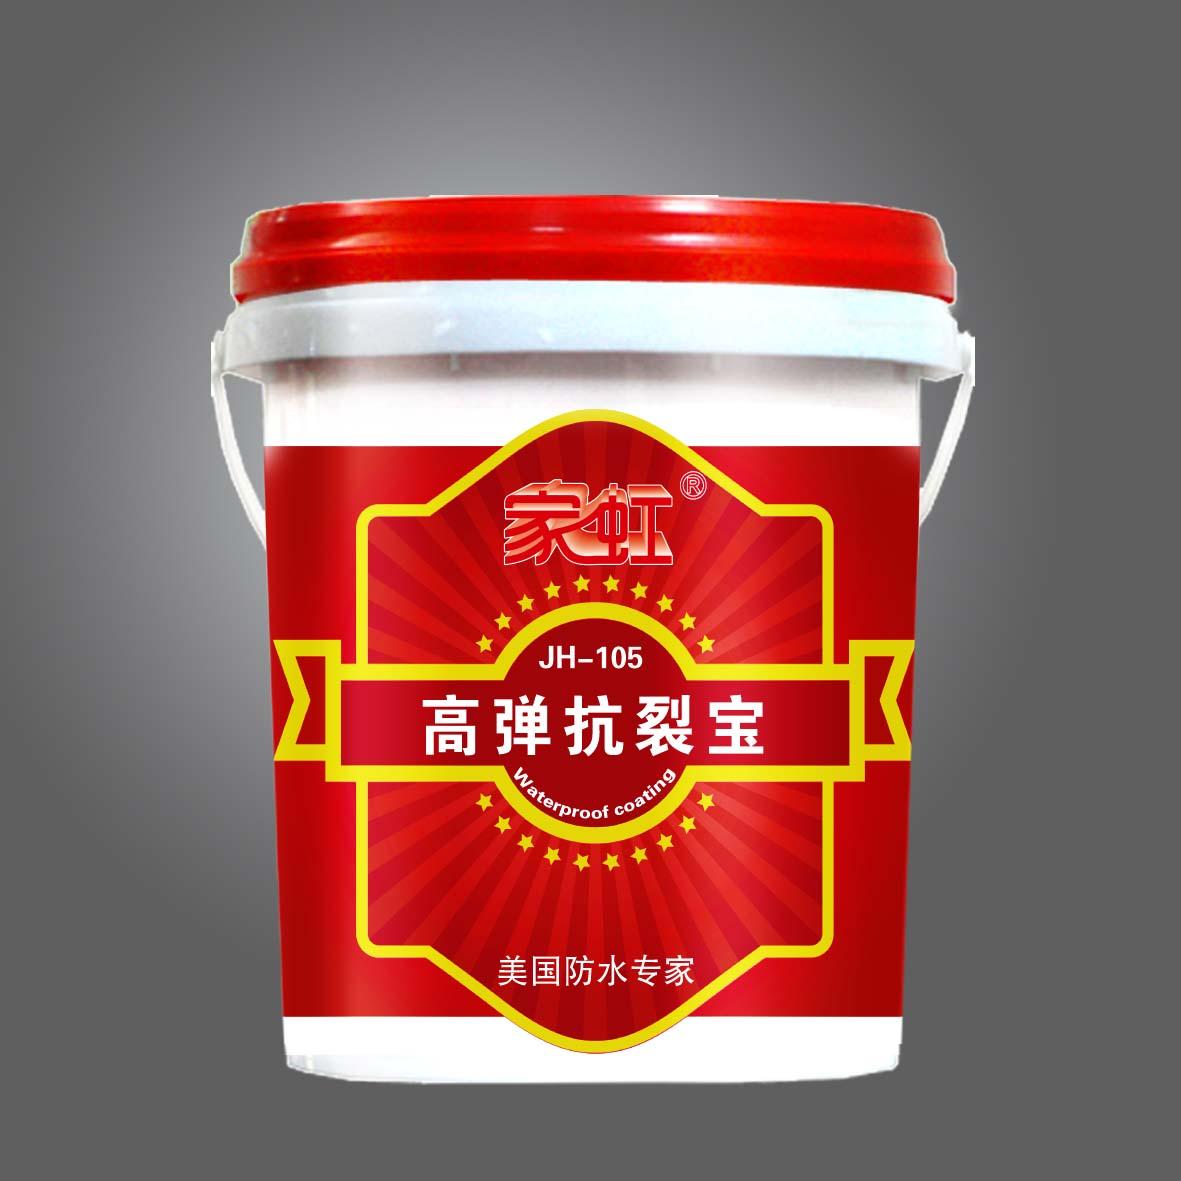 JH-105家虹高弹抗裂宝 抗裂宝